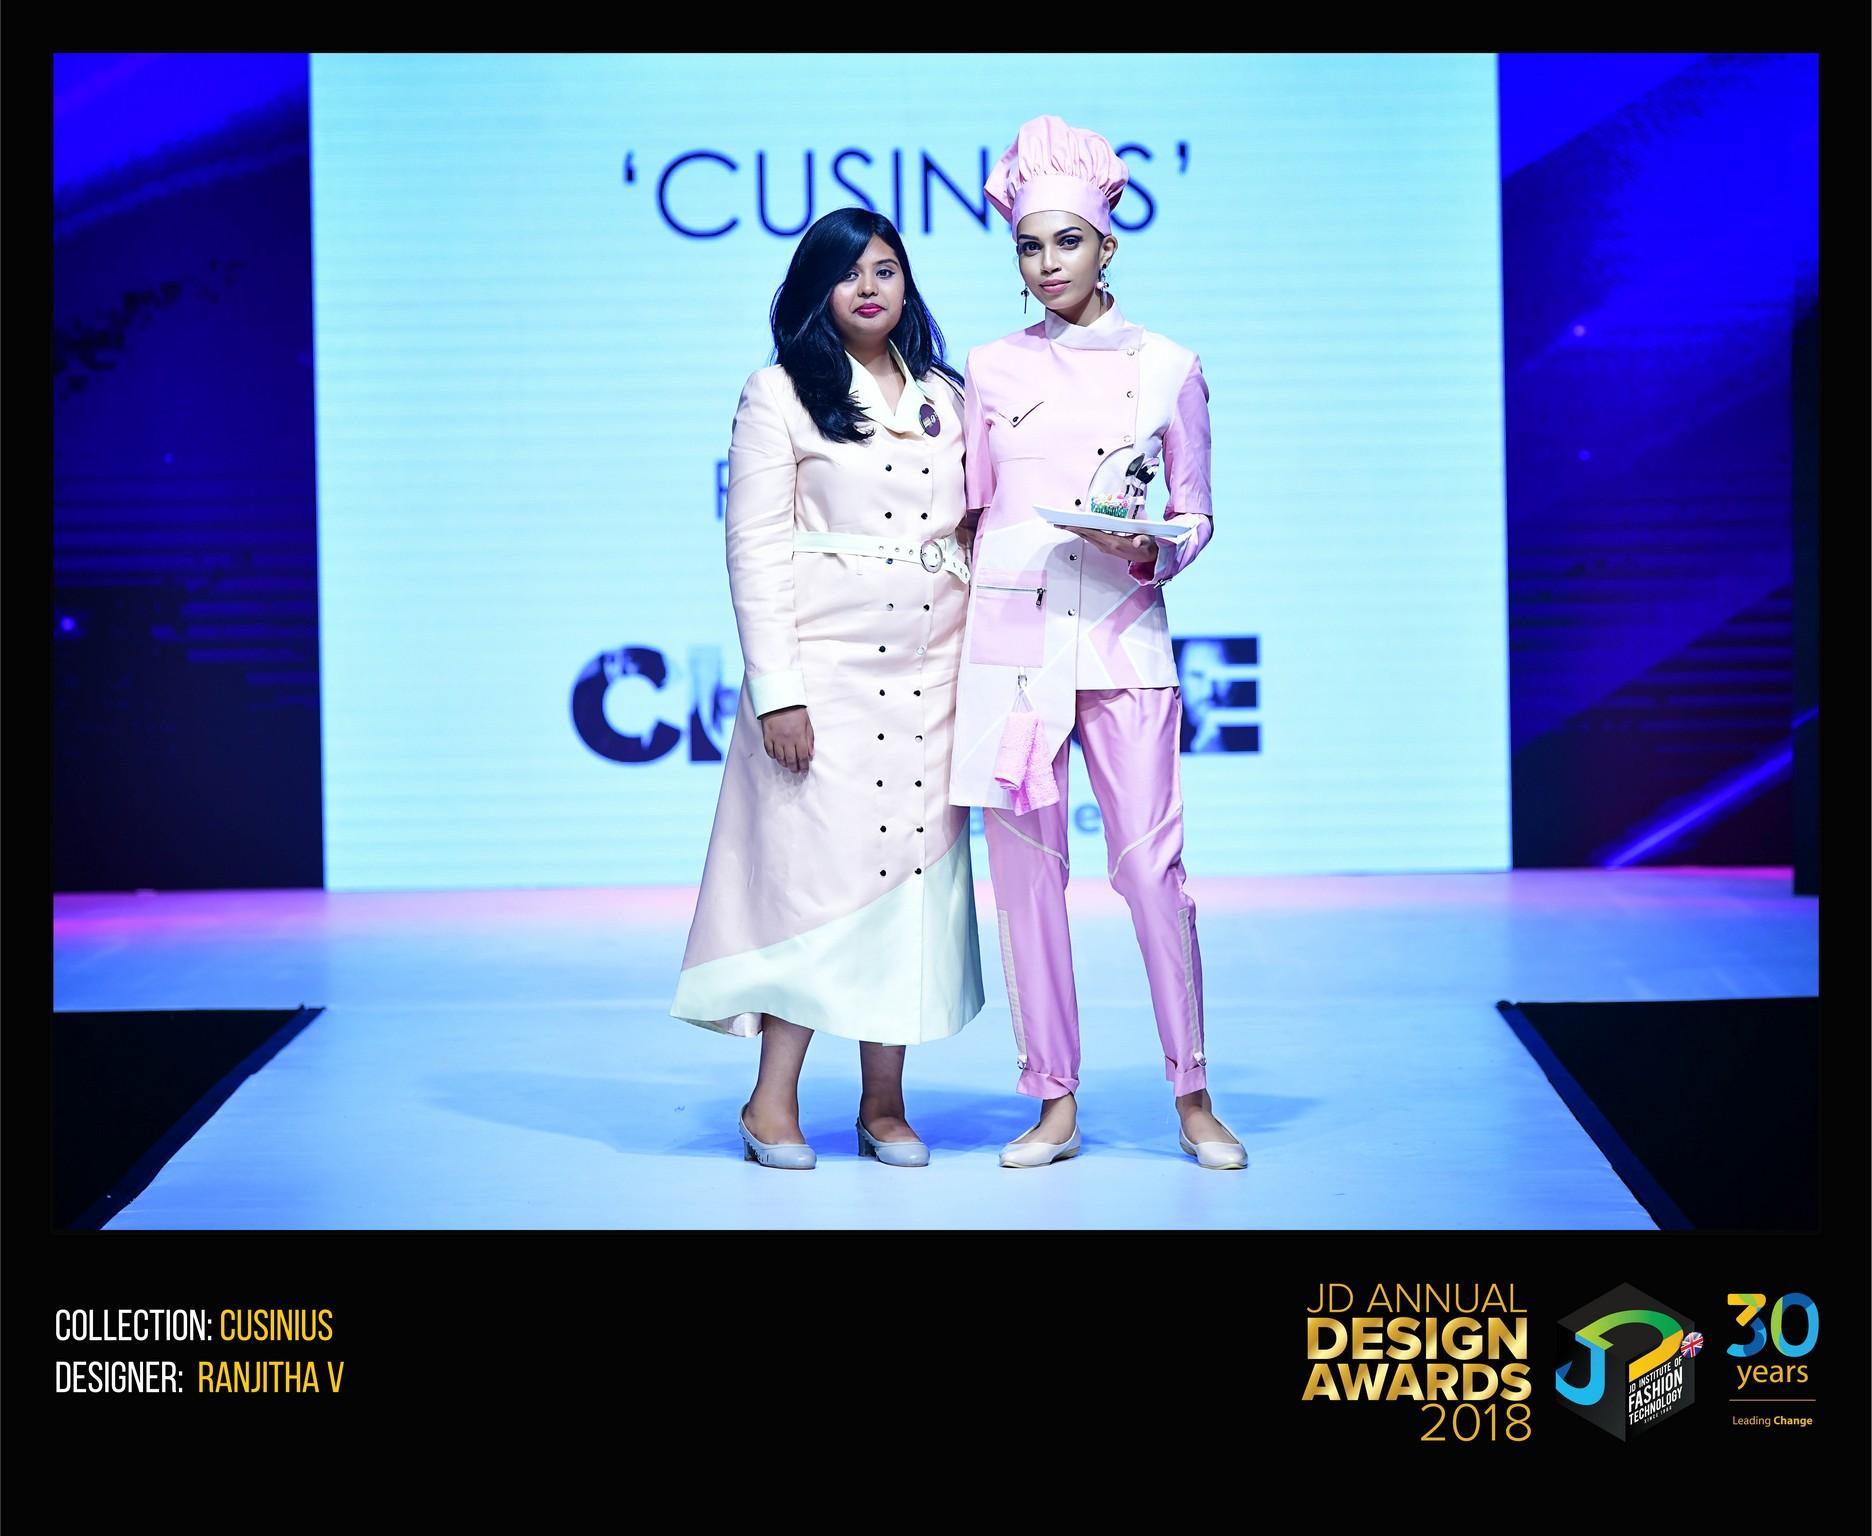 Cusinius – Change – JD Annual Design Awards 2018 | Designer: Ranjitha | Photography : Jerin Nath (@jerin_nath) cusinius Cusinius – Change – JD Annual Design Awards 2018 CUSINIUS 11